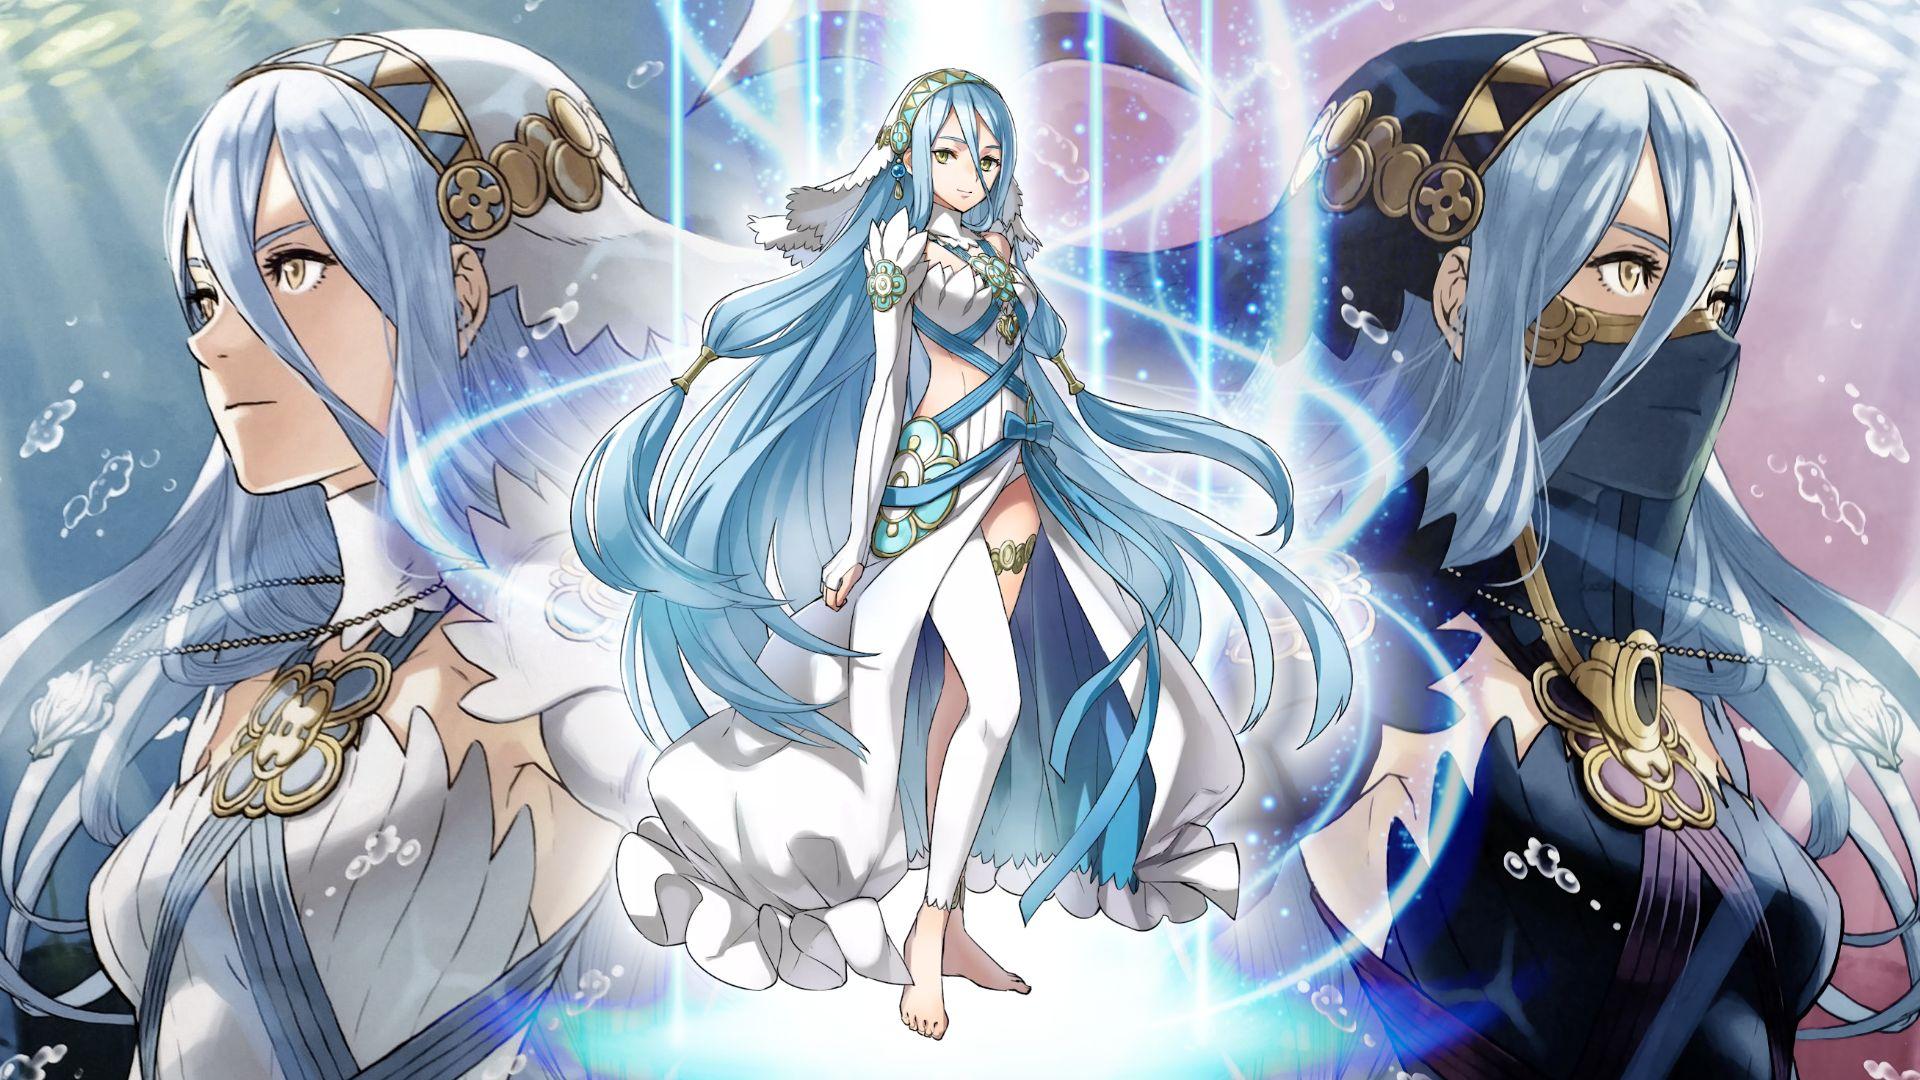 Fire Emblem Heroes Wallpaper Azura By Incognitoza On Deviantart